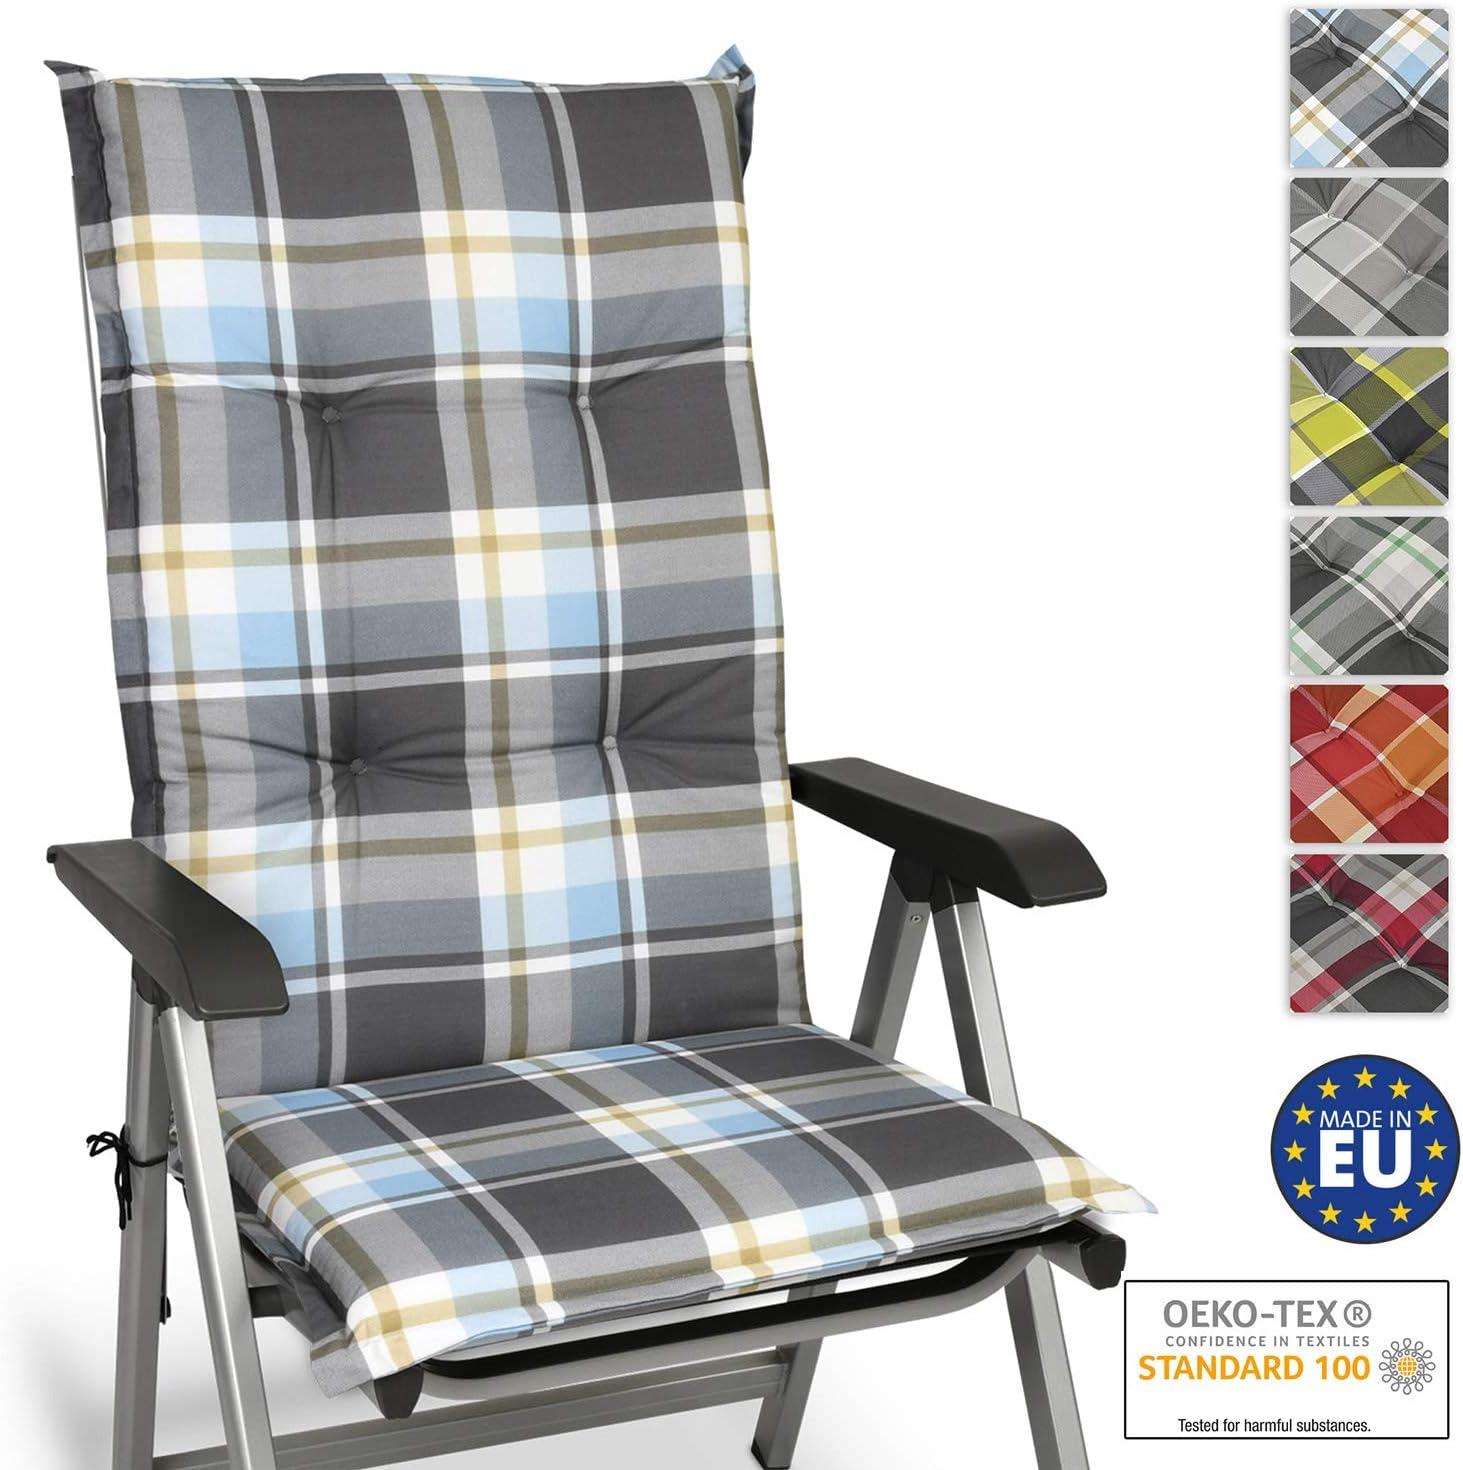 Beautissu High Back Garden Chair Seat Cushion Set of 6 Sunny HL 120x50x6cm Grey